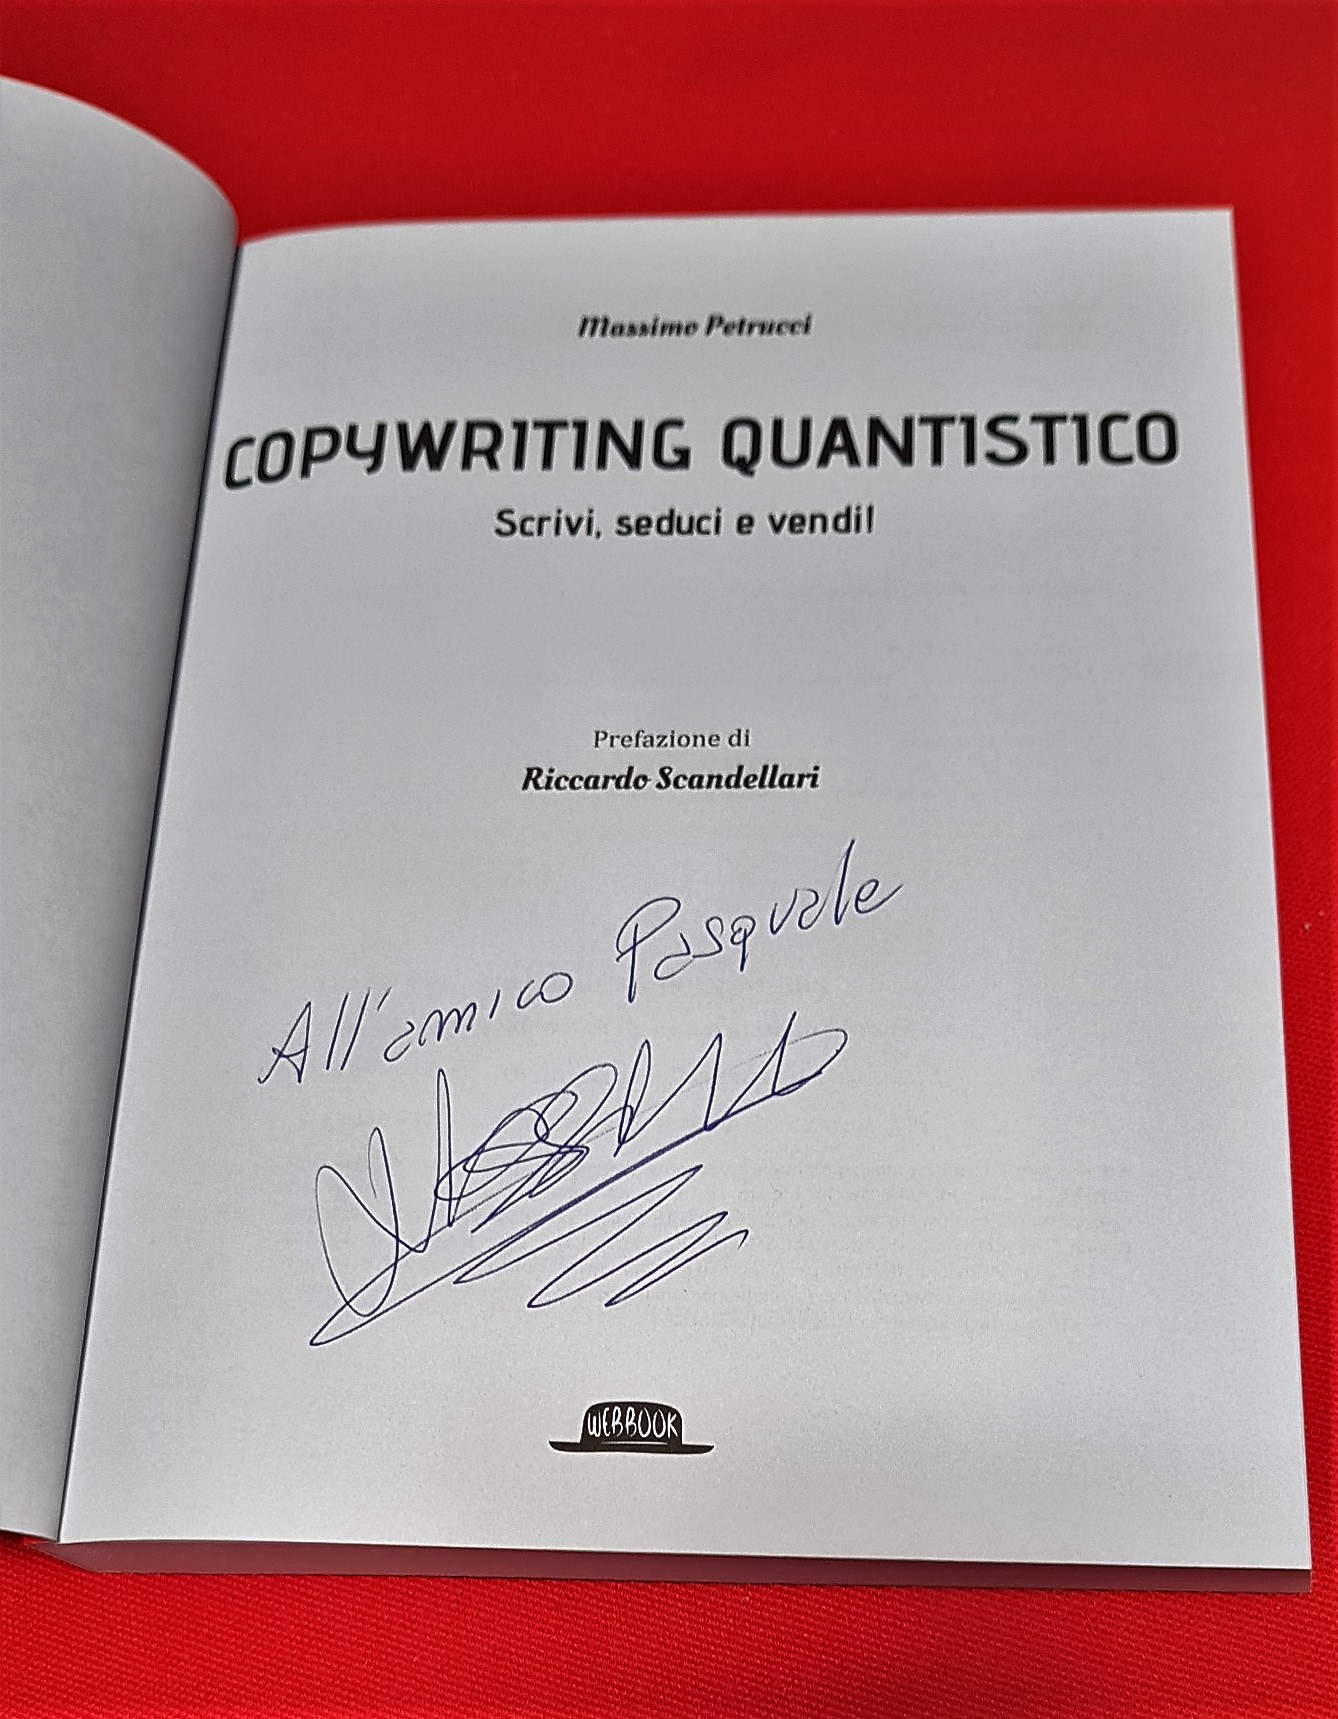 Copywriting quantistico Massimo Petrucci